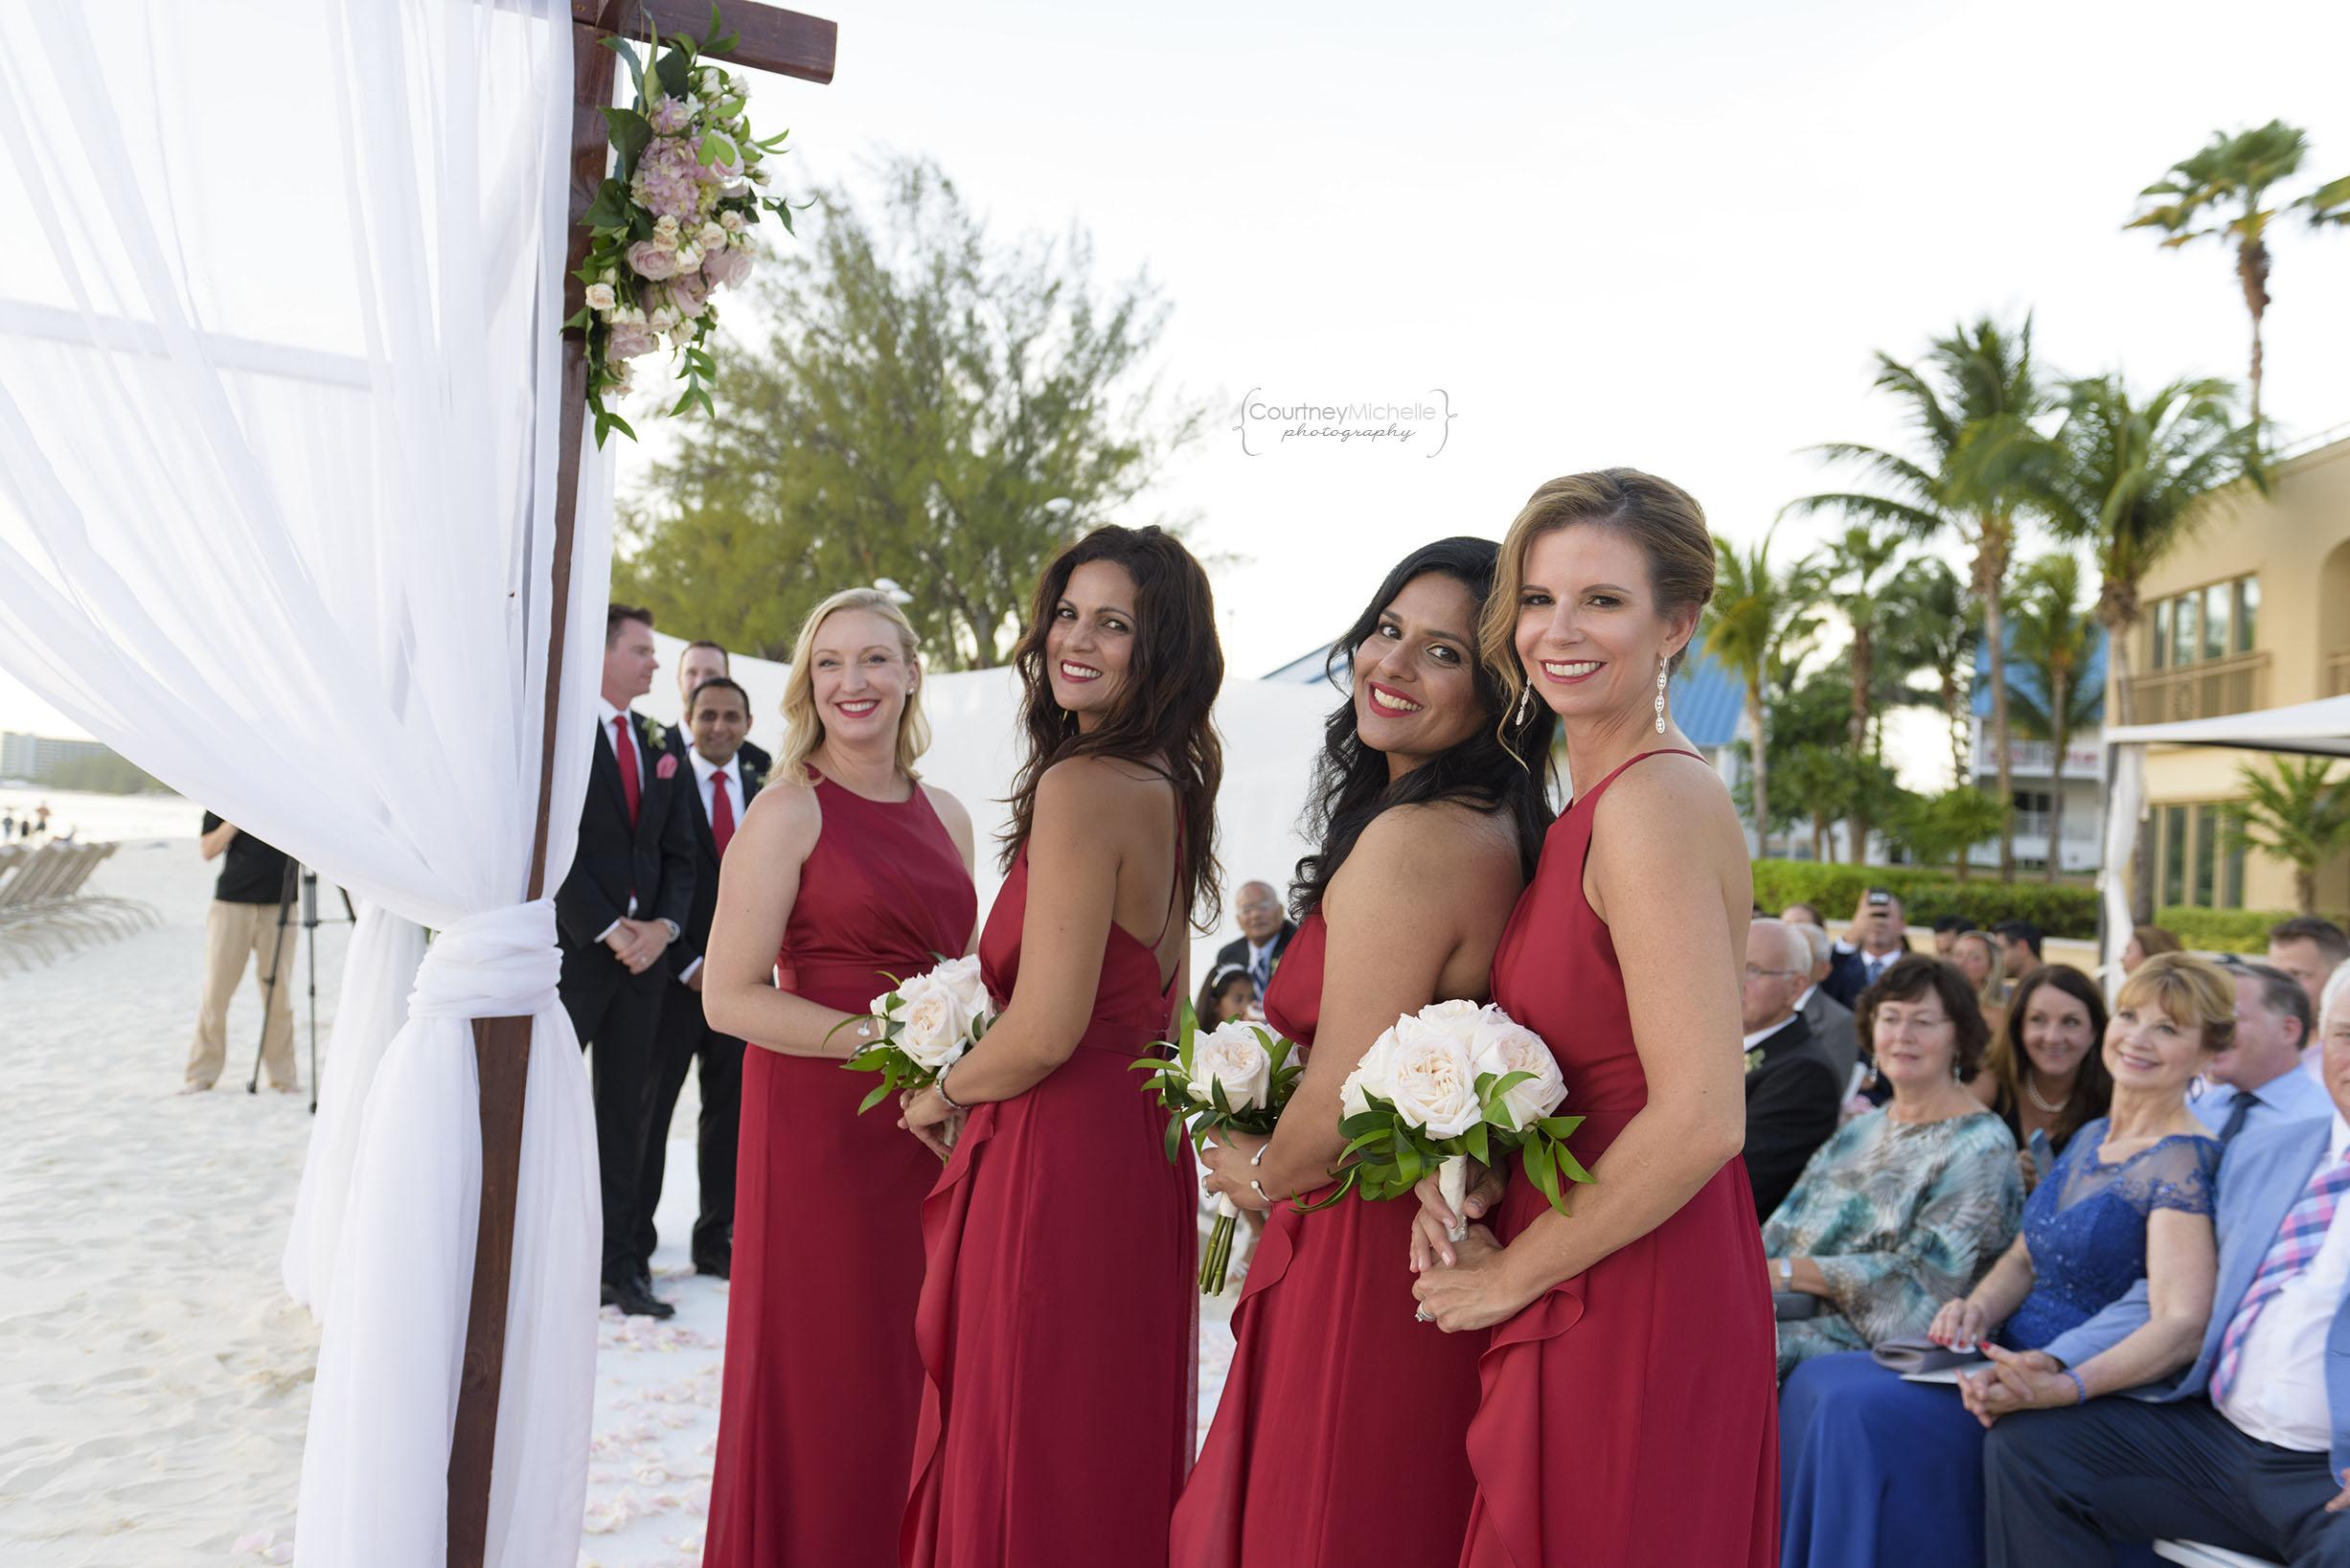 bridesmaides-grand-cayman-beach-wedding-photography-by-courtney-laper©CopyrightCMP-LeaAnneRaj-7774.jpg